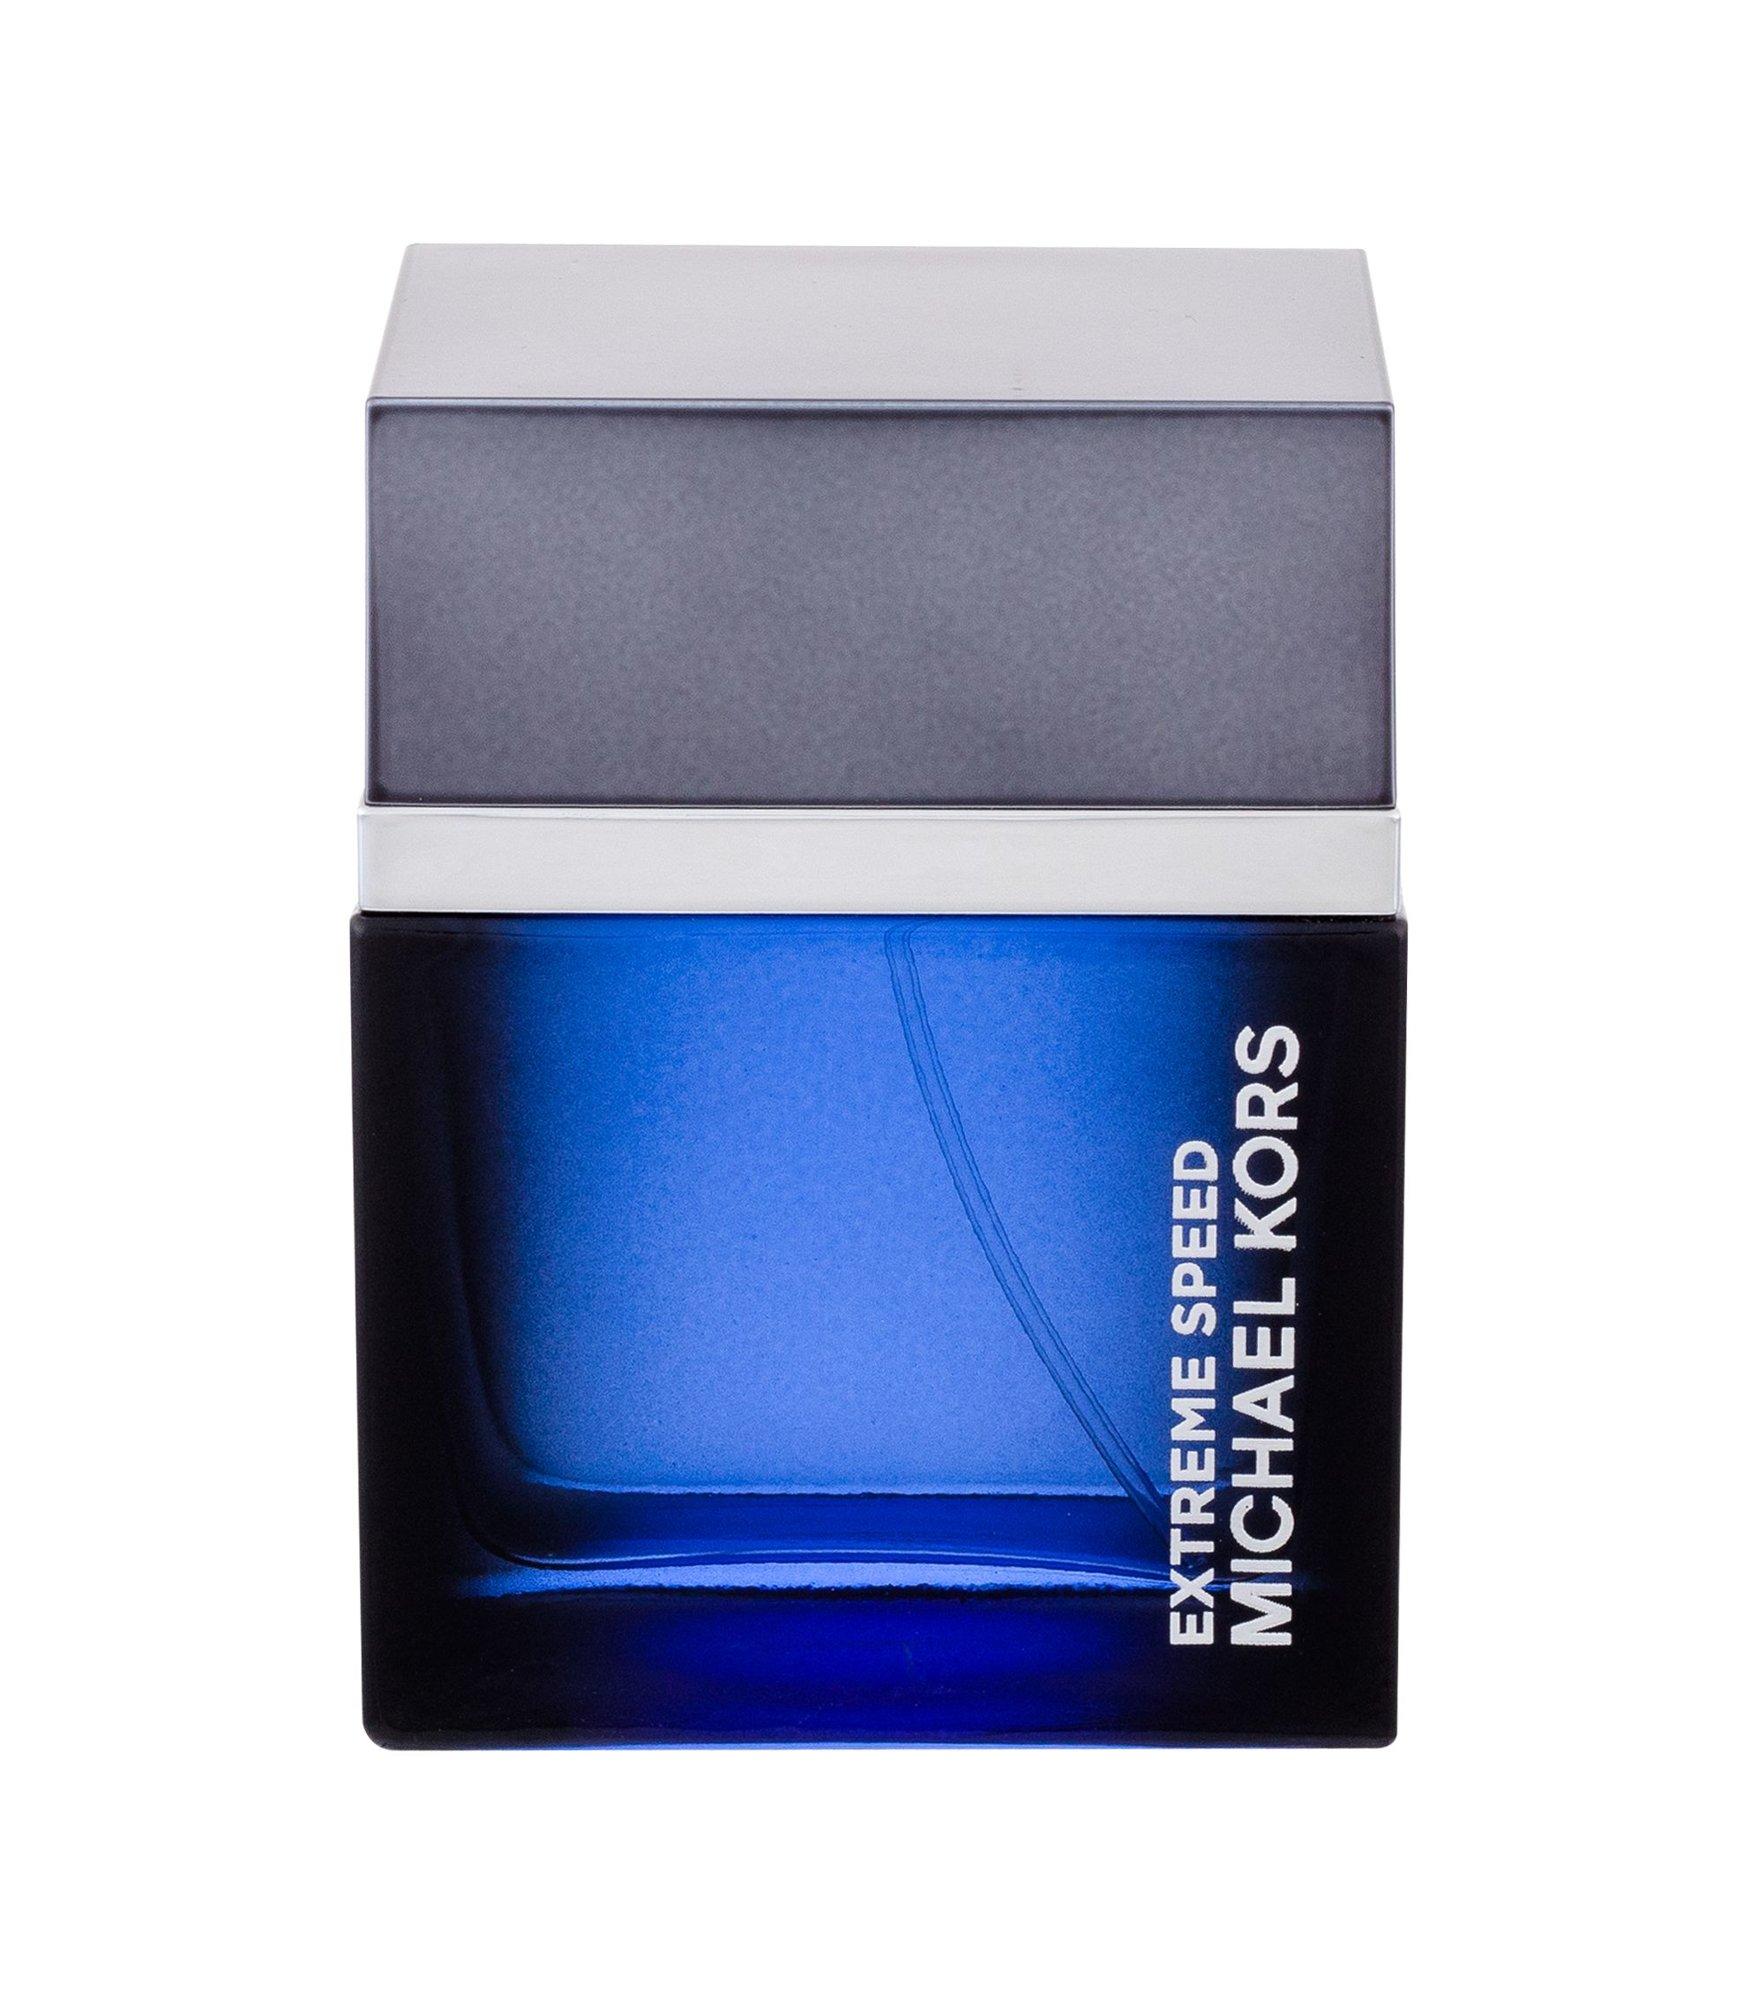 Michael Kors Extreme Speed, Toaletná voda 120ml - Tester